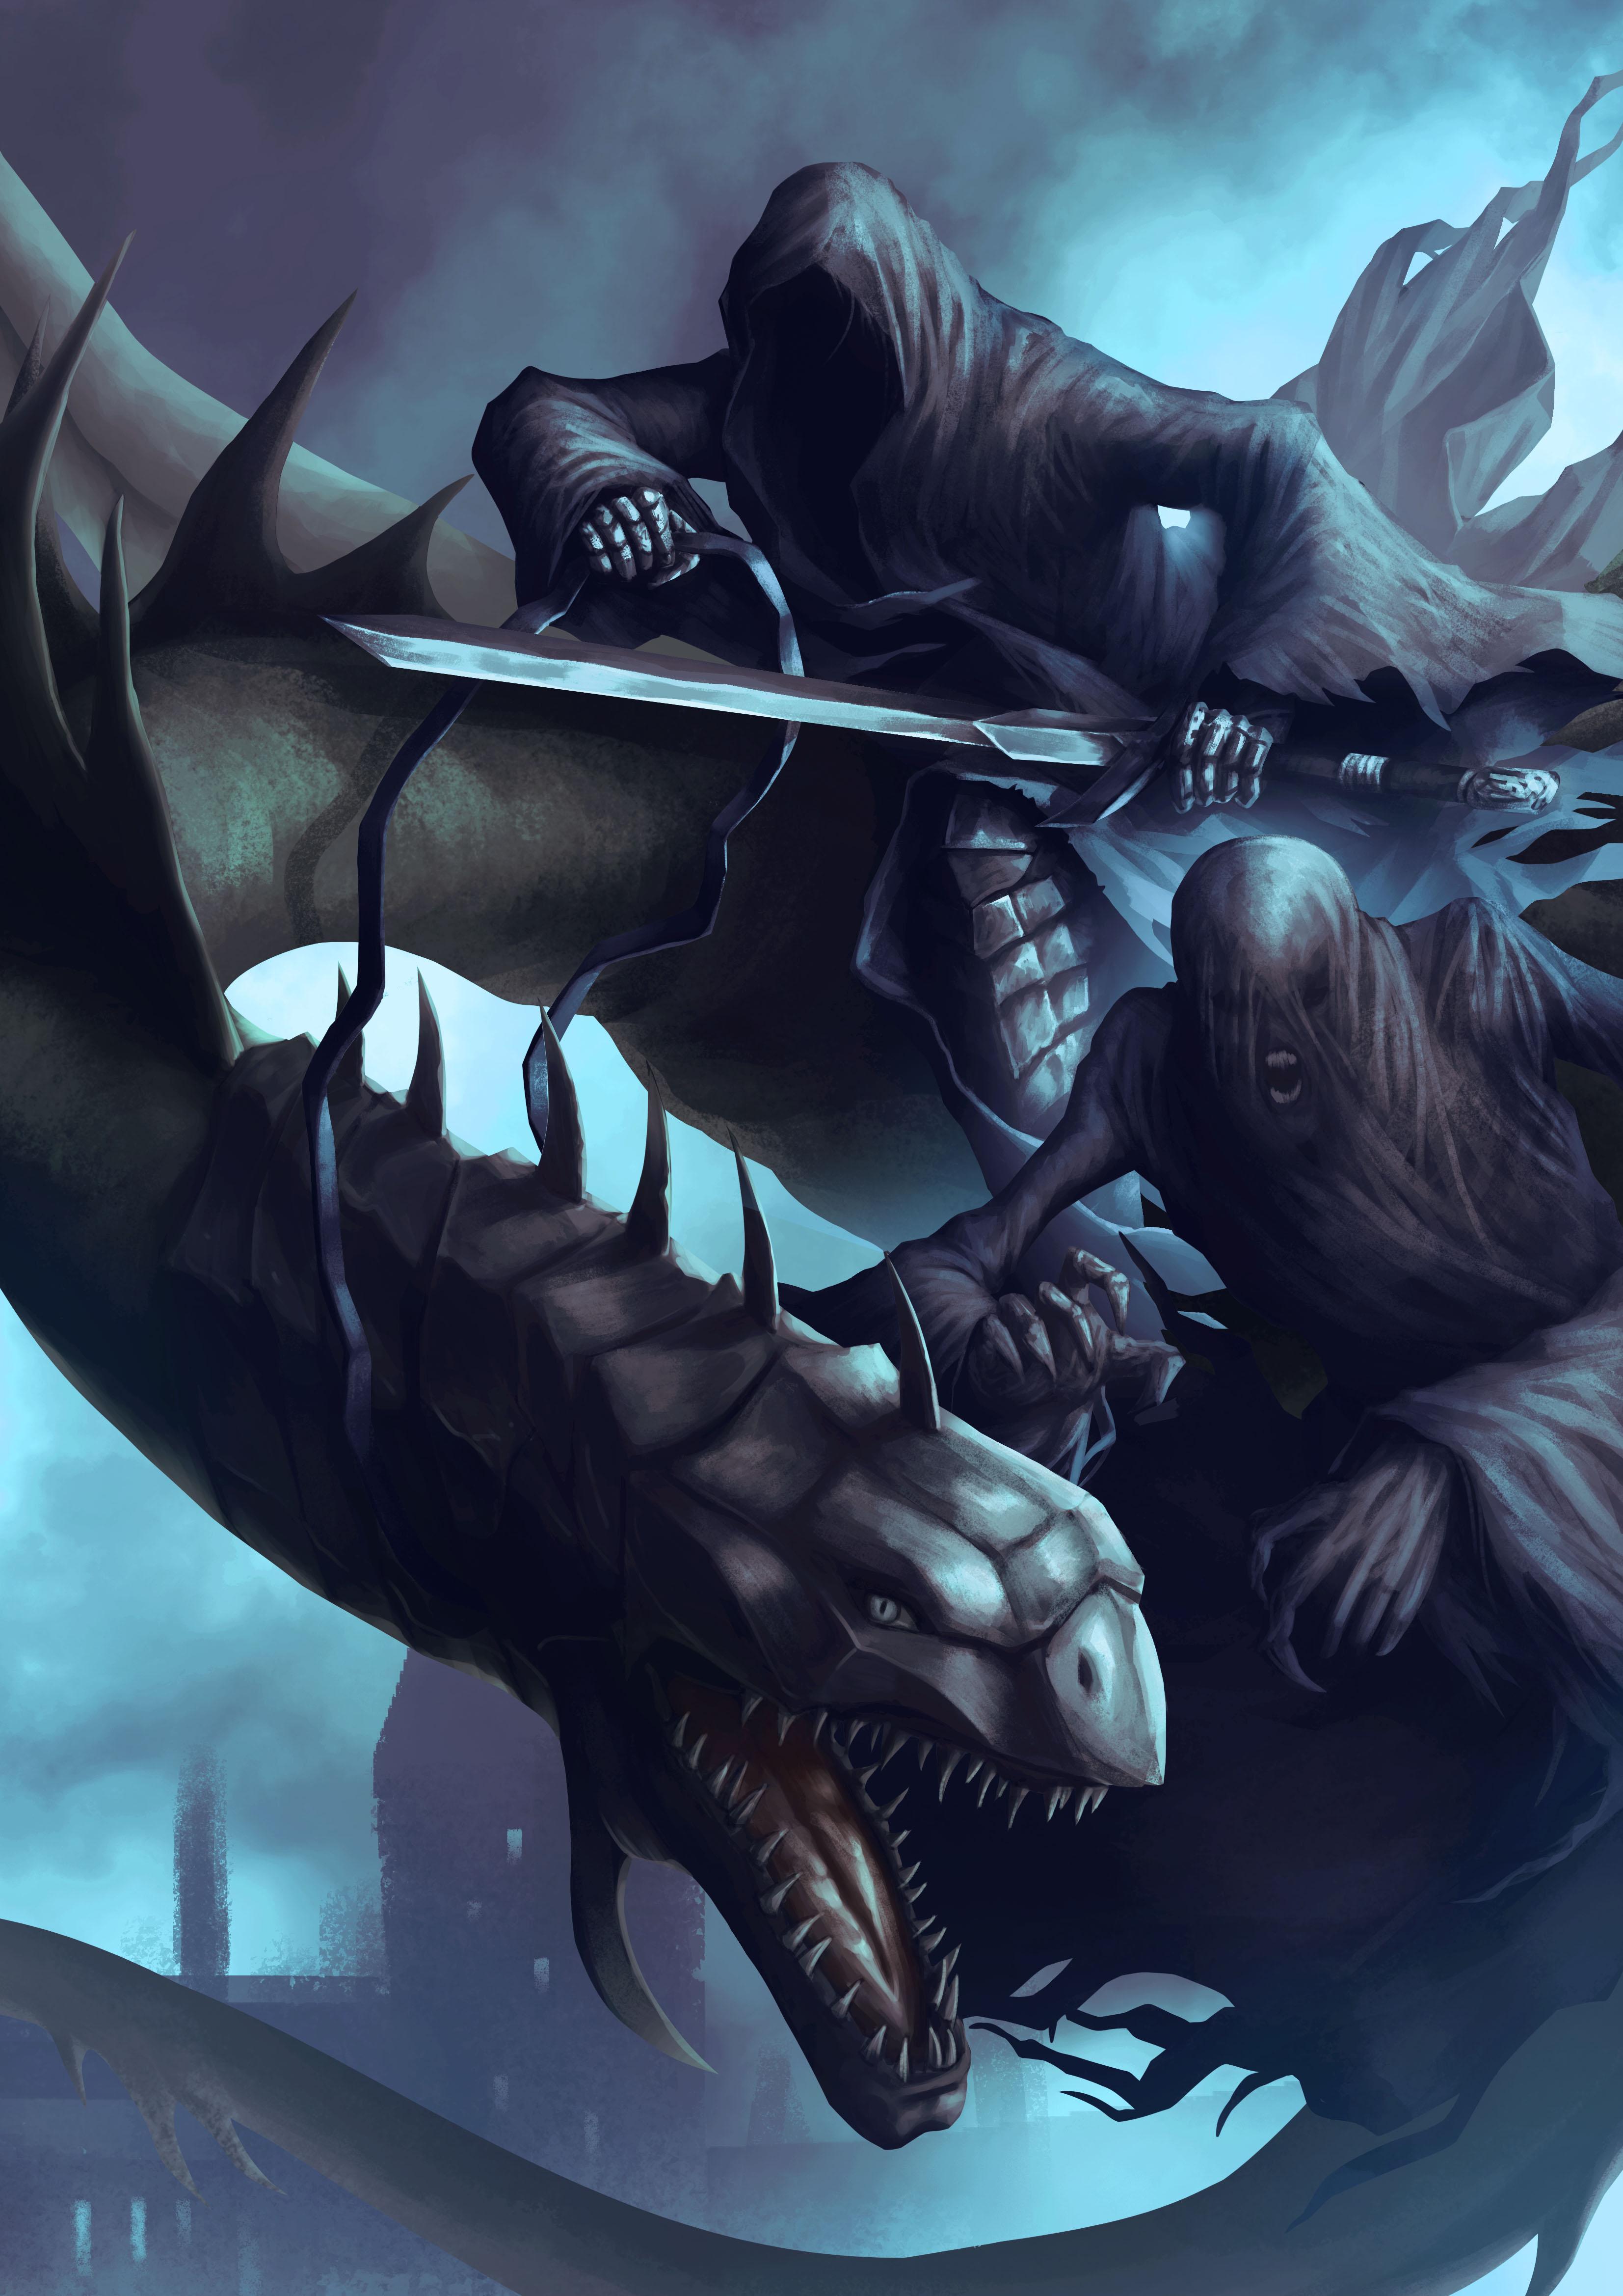 Nazgul and Dementor